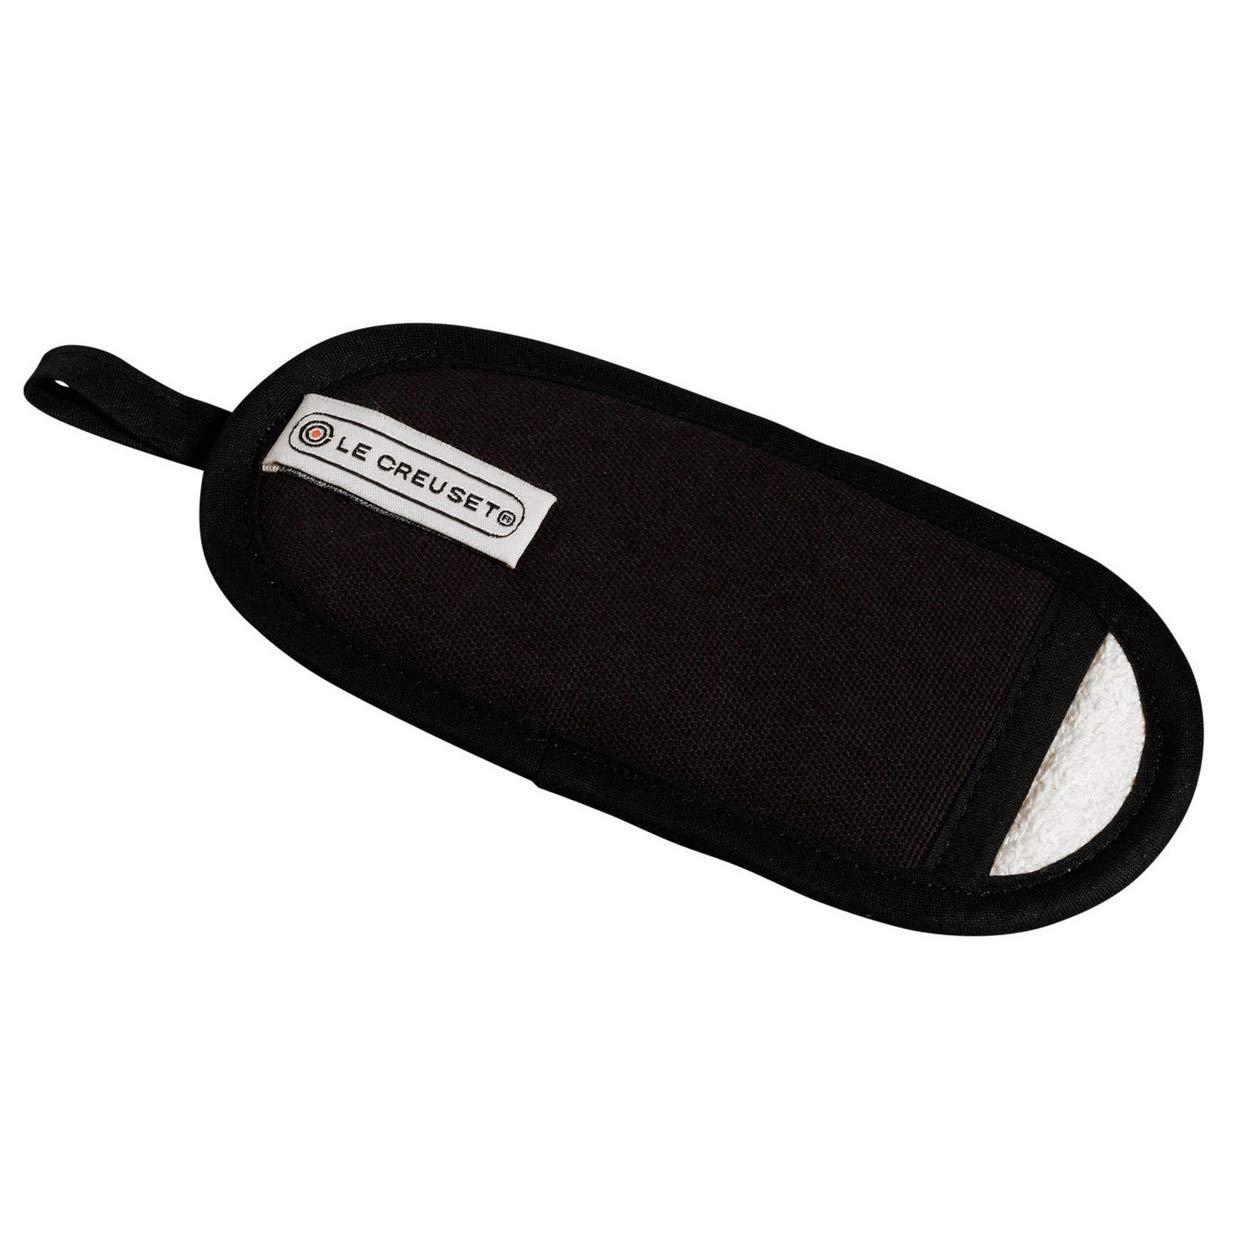 Le Creuset Textiles Handle Glove - Black TH4913-31 491300 kitchen accessories oven gloves